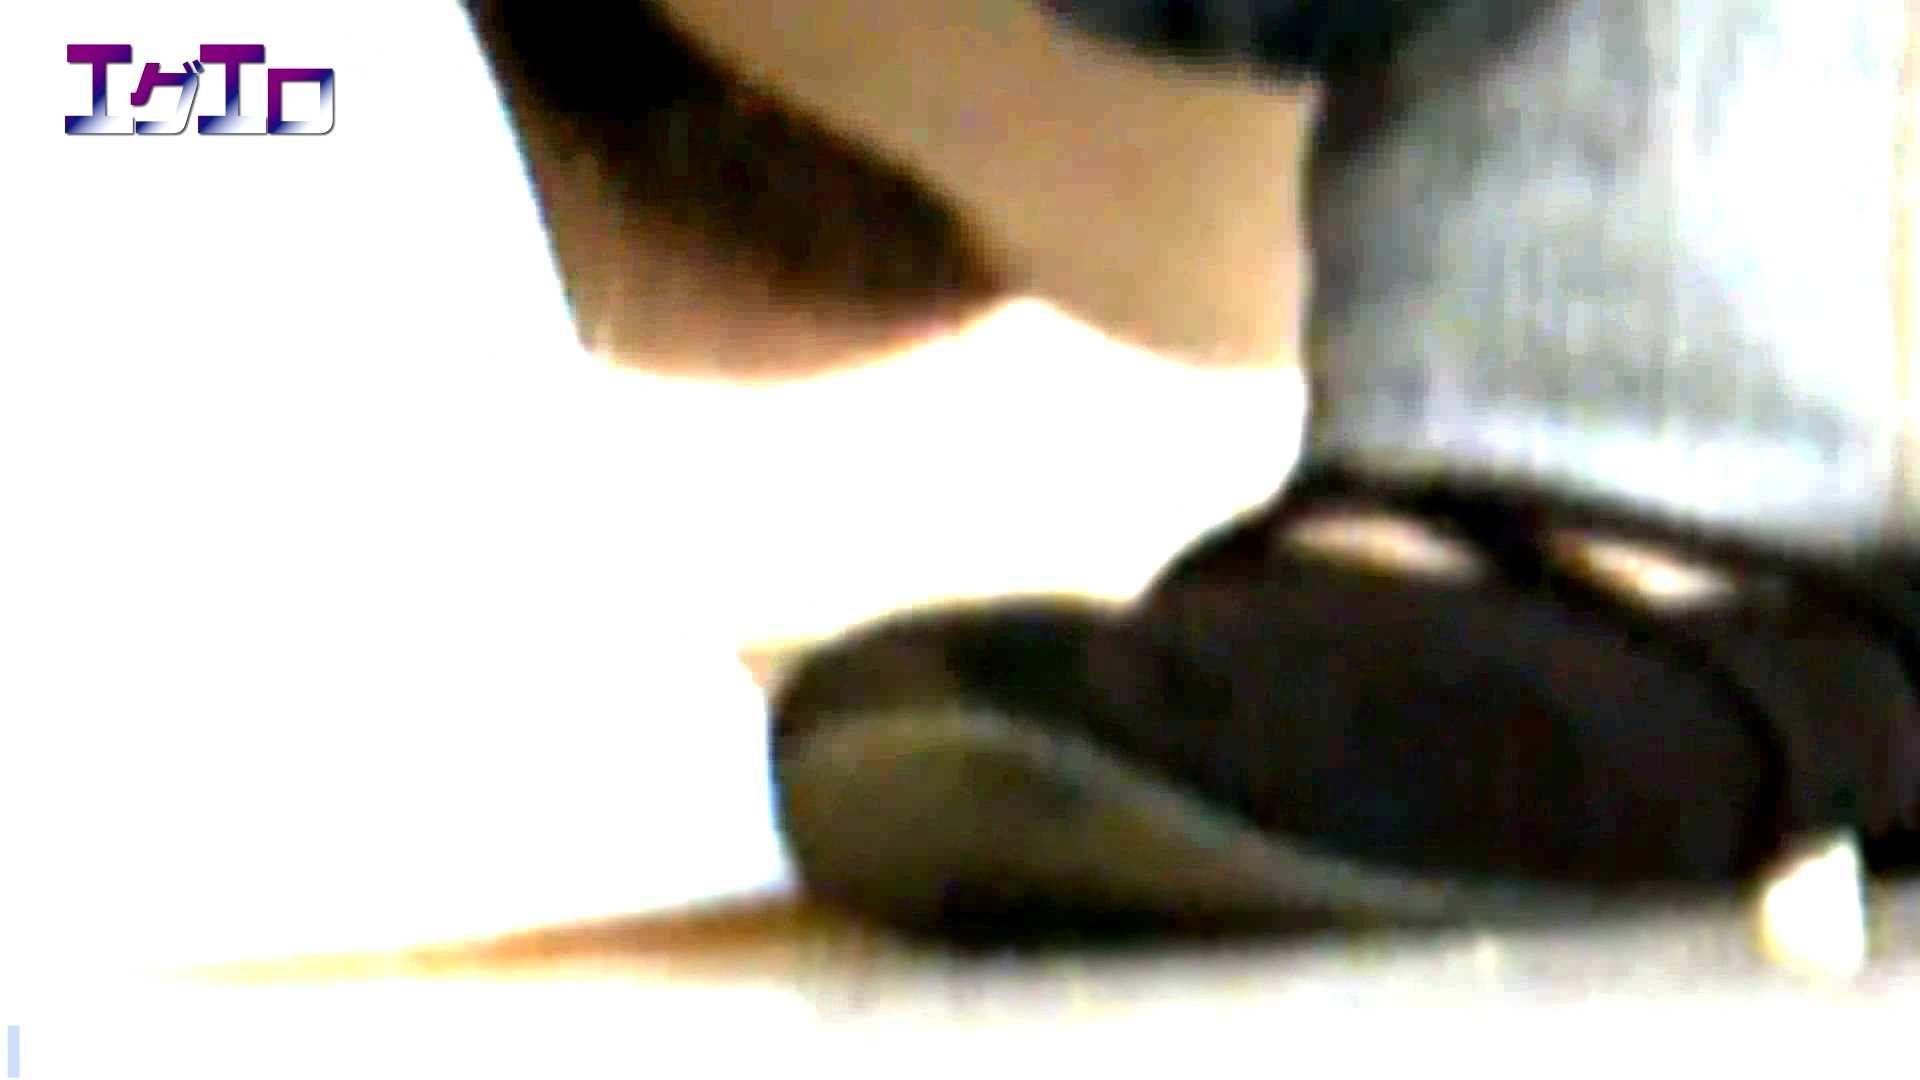 至近距離洗面所 Vol.08 丸見え ワレメ無修正動画無料 48画像 2